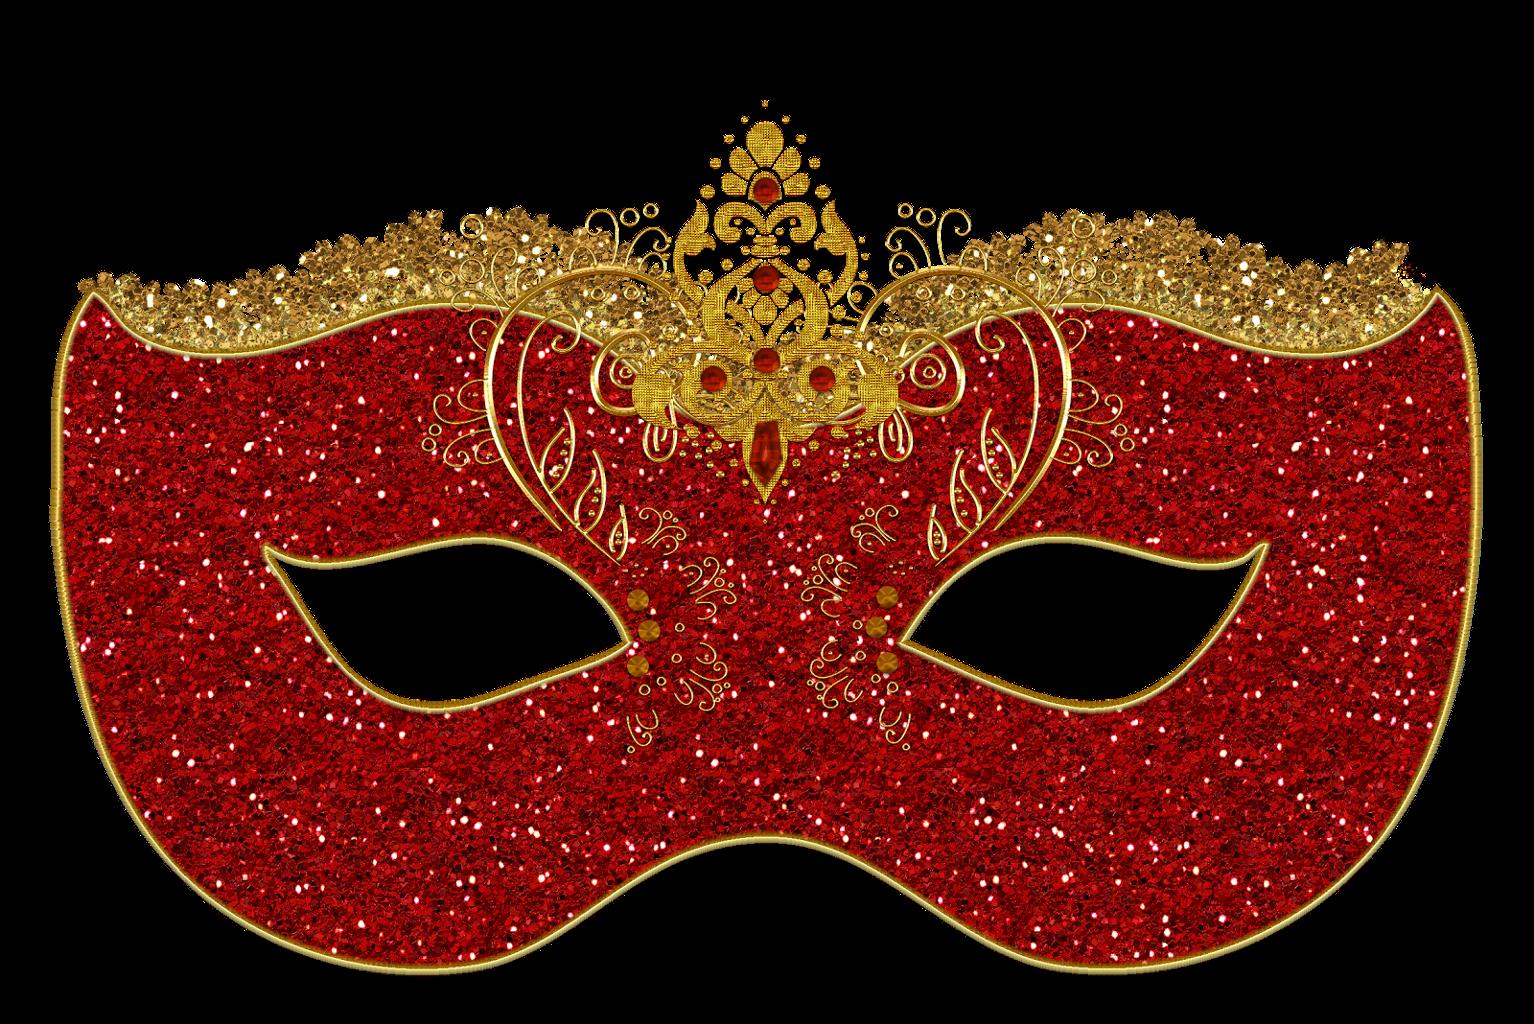 Masquerademask masks masqueradeball report. Mask clipart masquerade